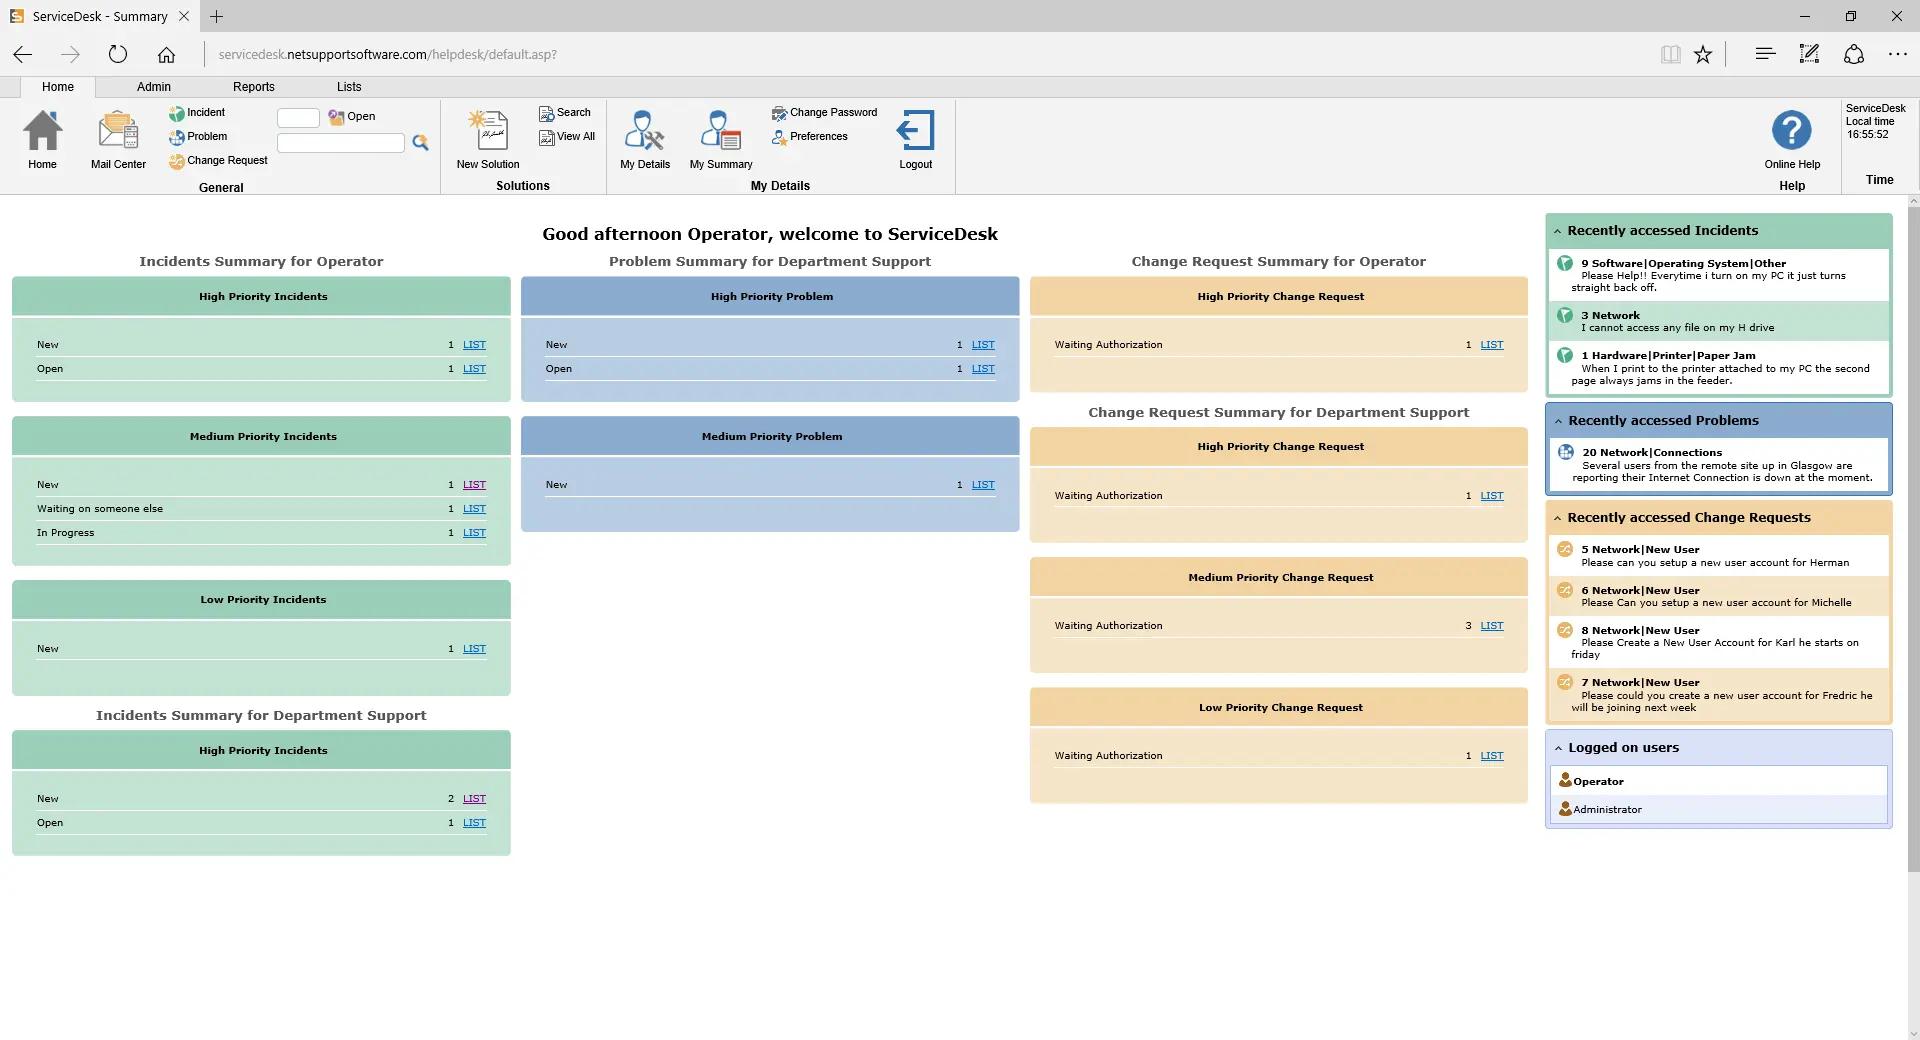 NetSupport ServiceDesk Software - NetSupport ServiceDesk - Summary view of helpdesk activity